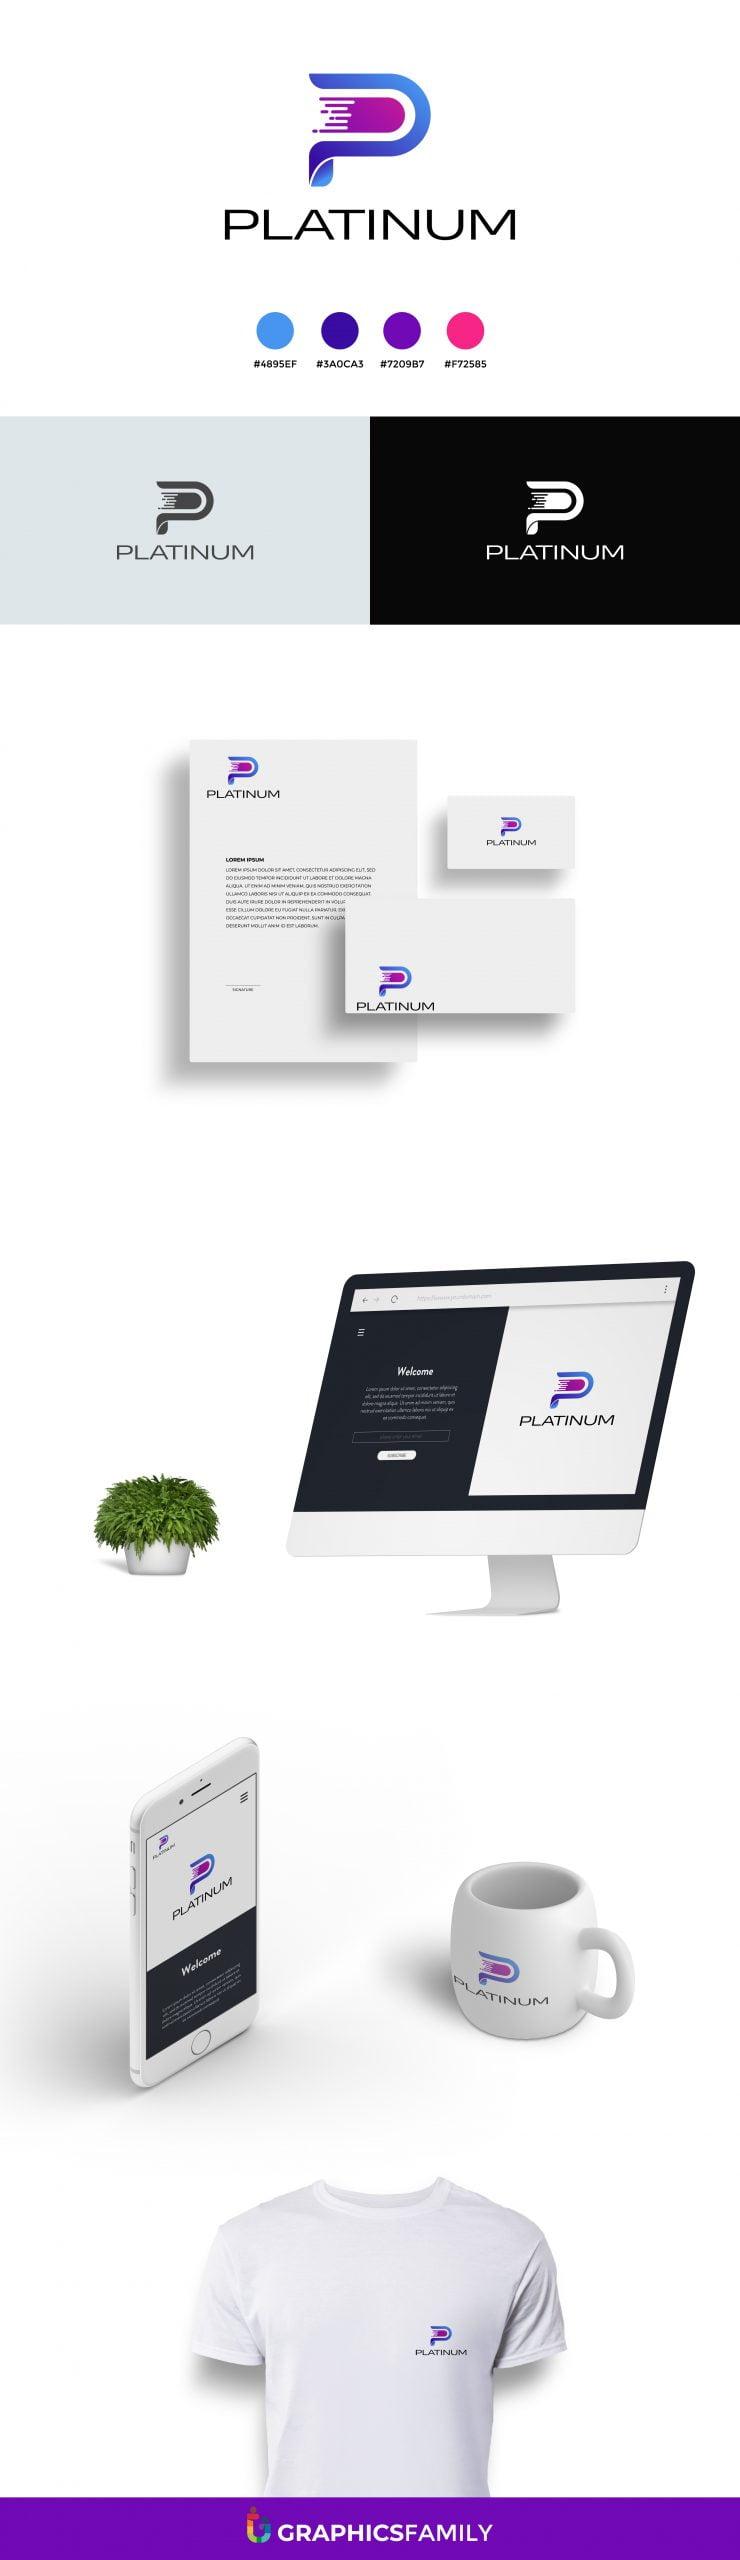 Letter P Logo Design Template Download